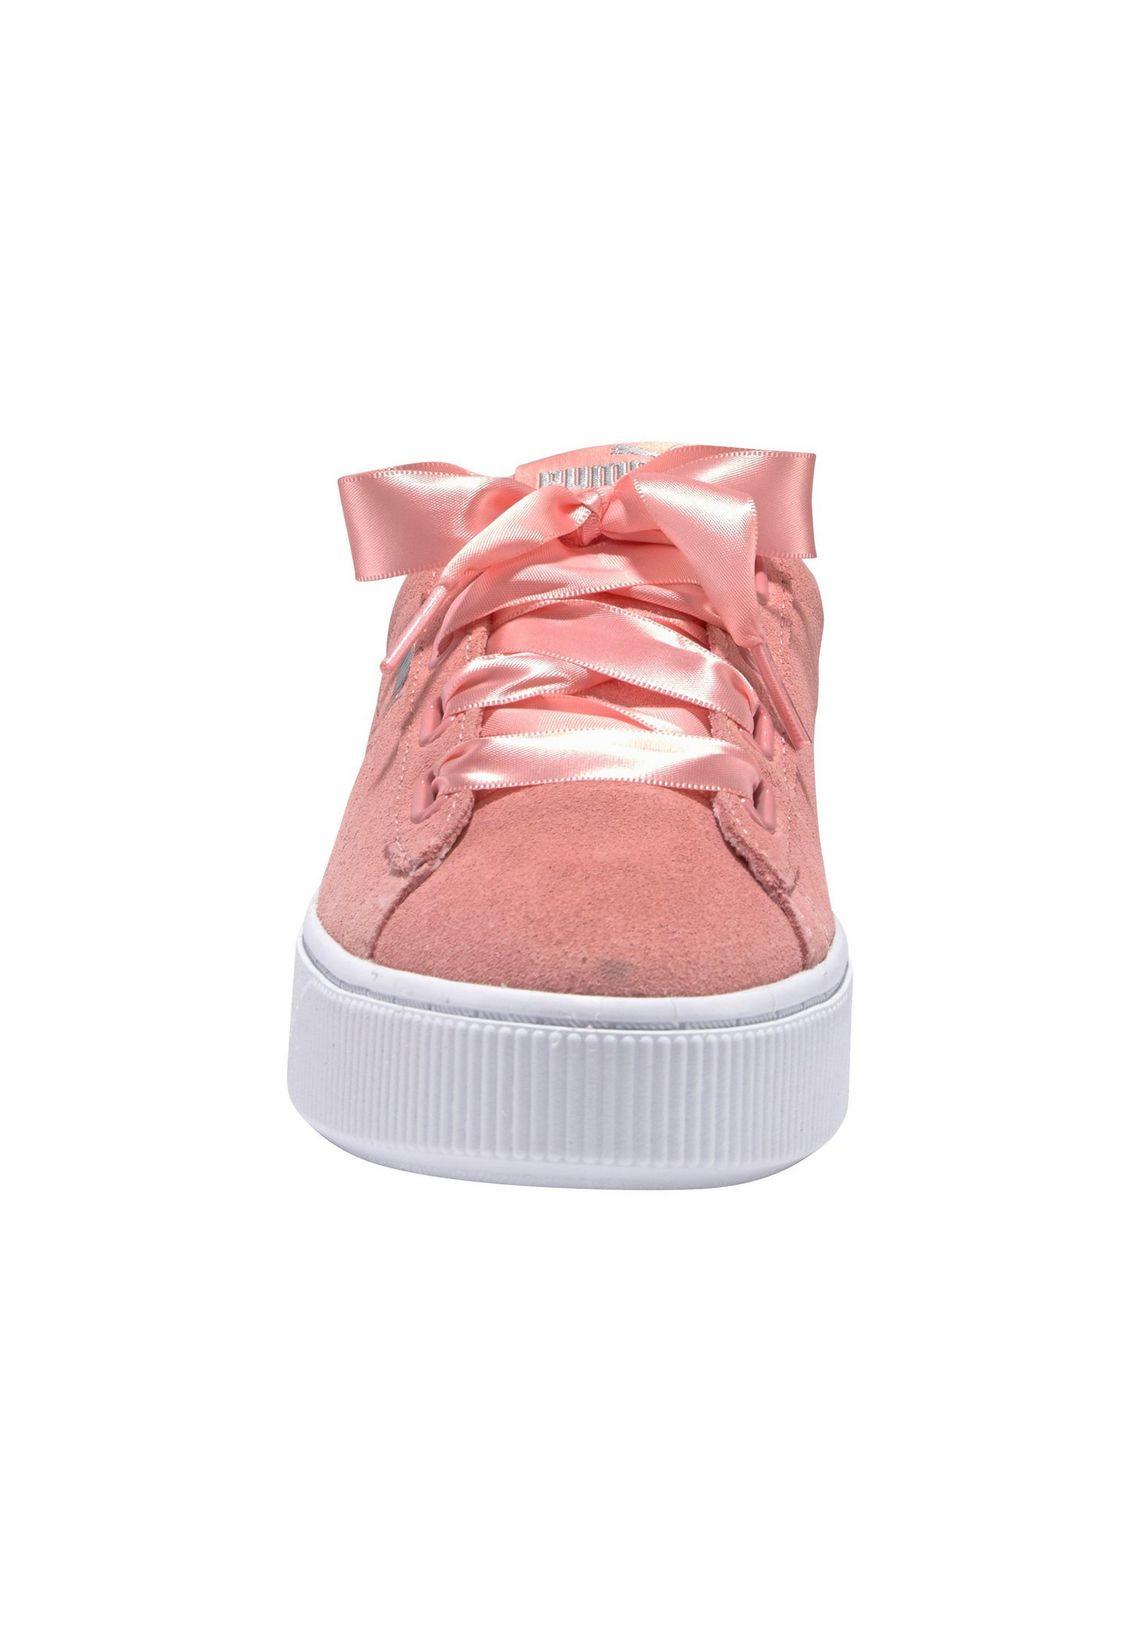 PUMA sneakers  Puma Vikky Stacked Ribbo bestellen bij  lichtpink/wit